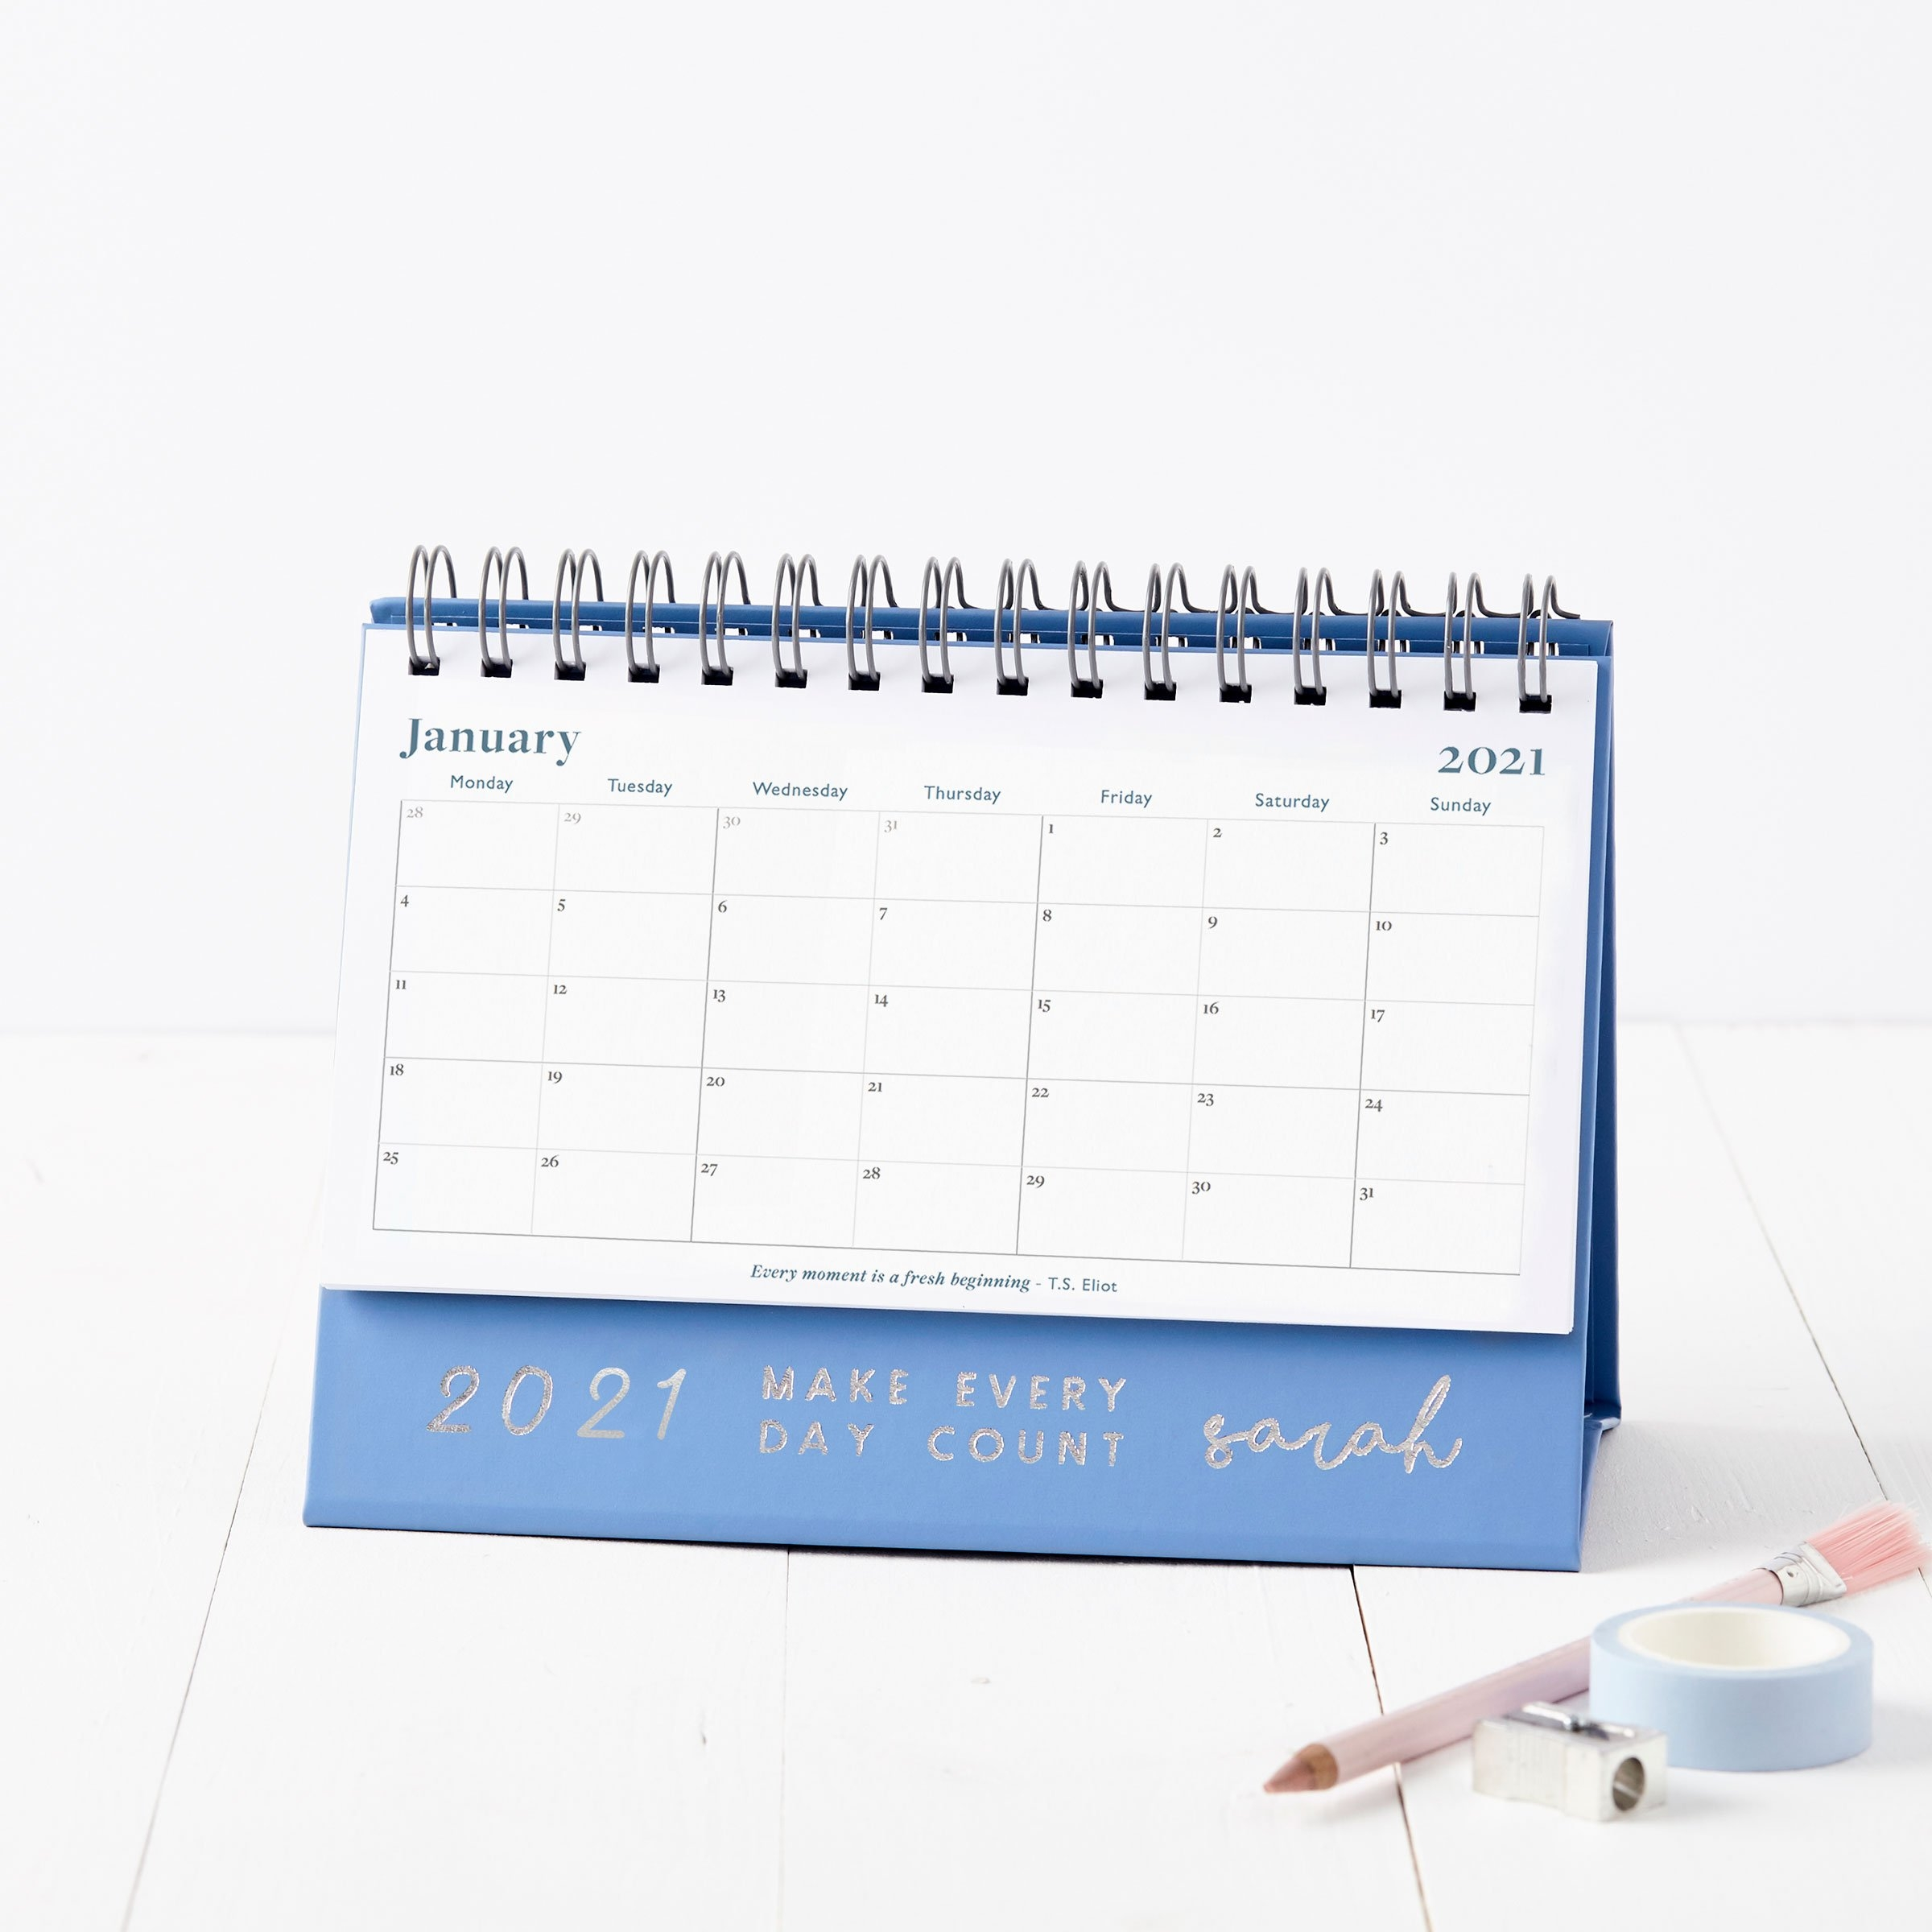 Personalised Make It Count 2021 Desk Calendar   Martha Brook with regard to Calendar Photo Maker 2021 Image